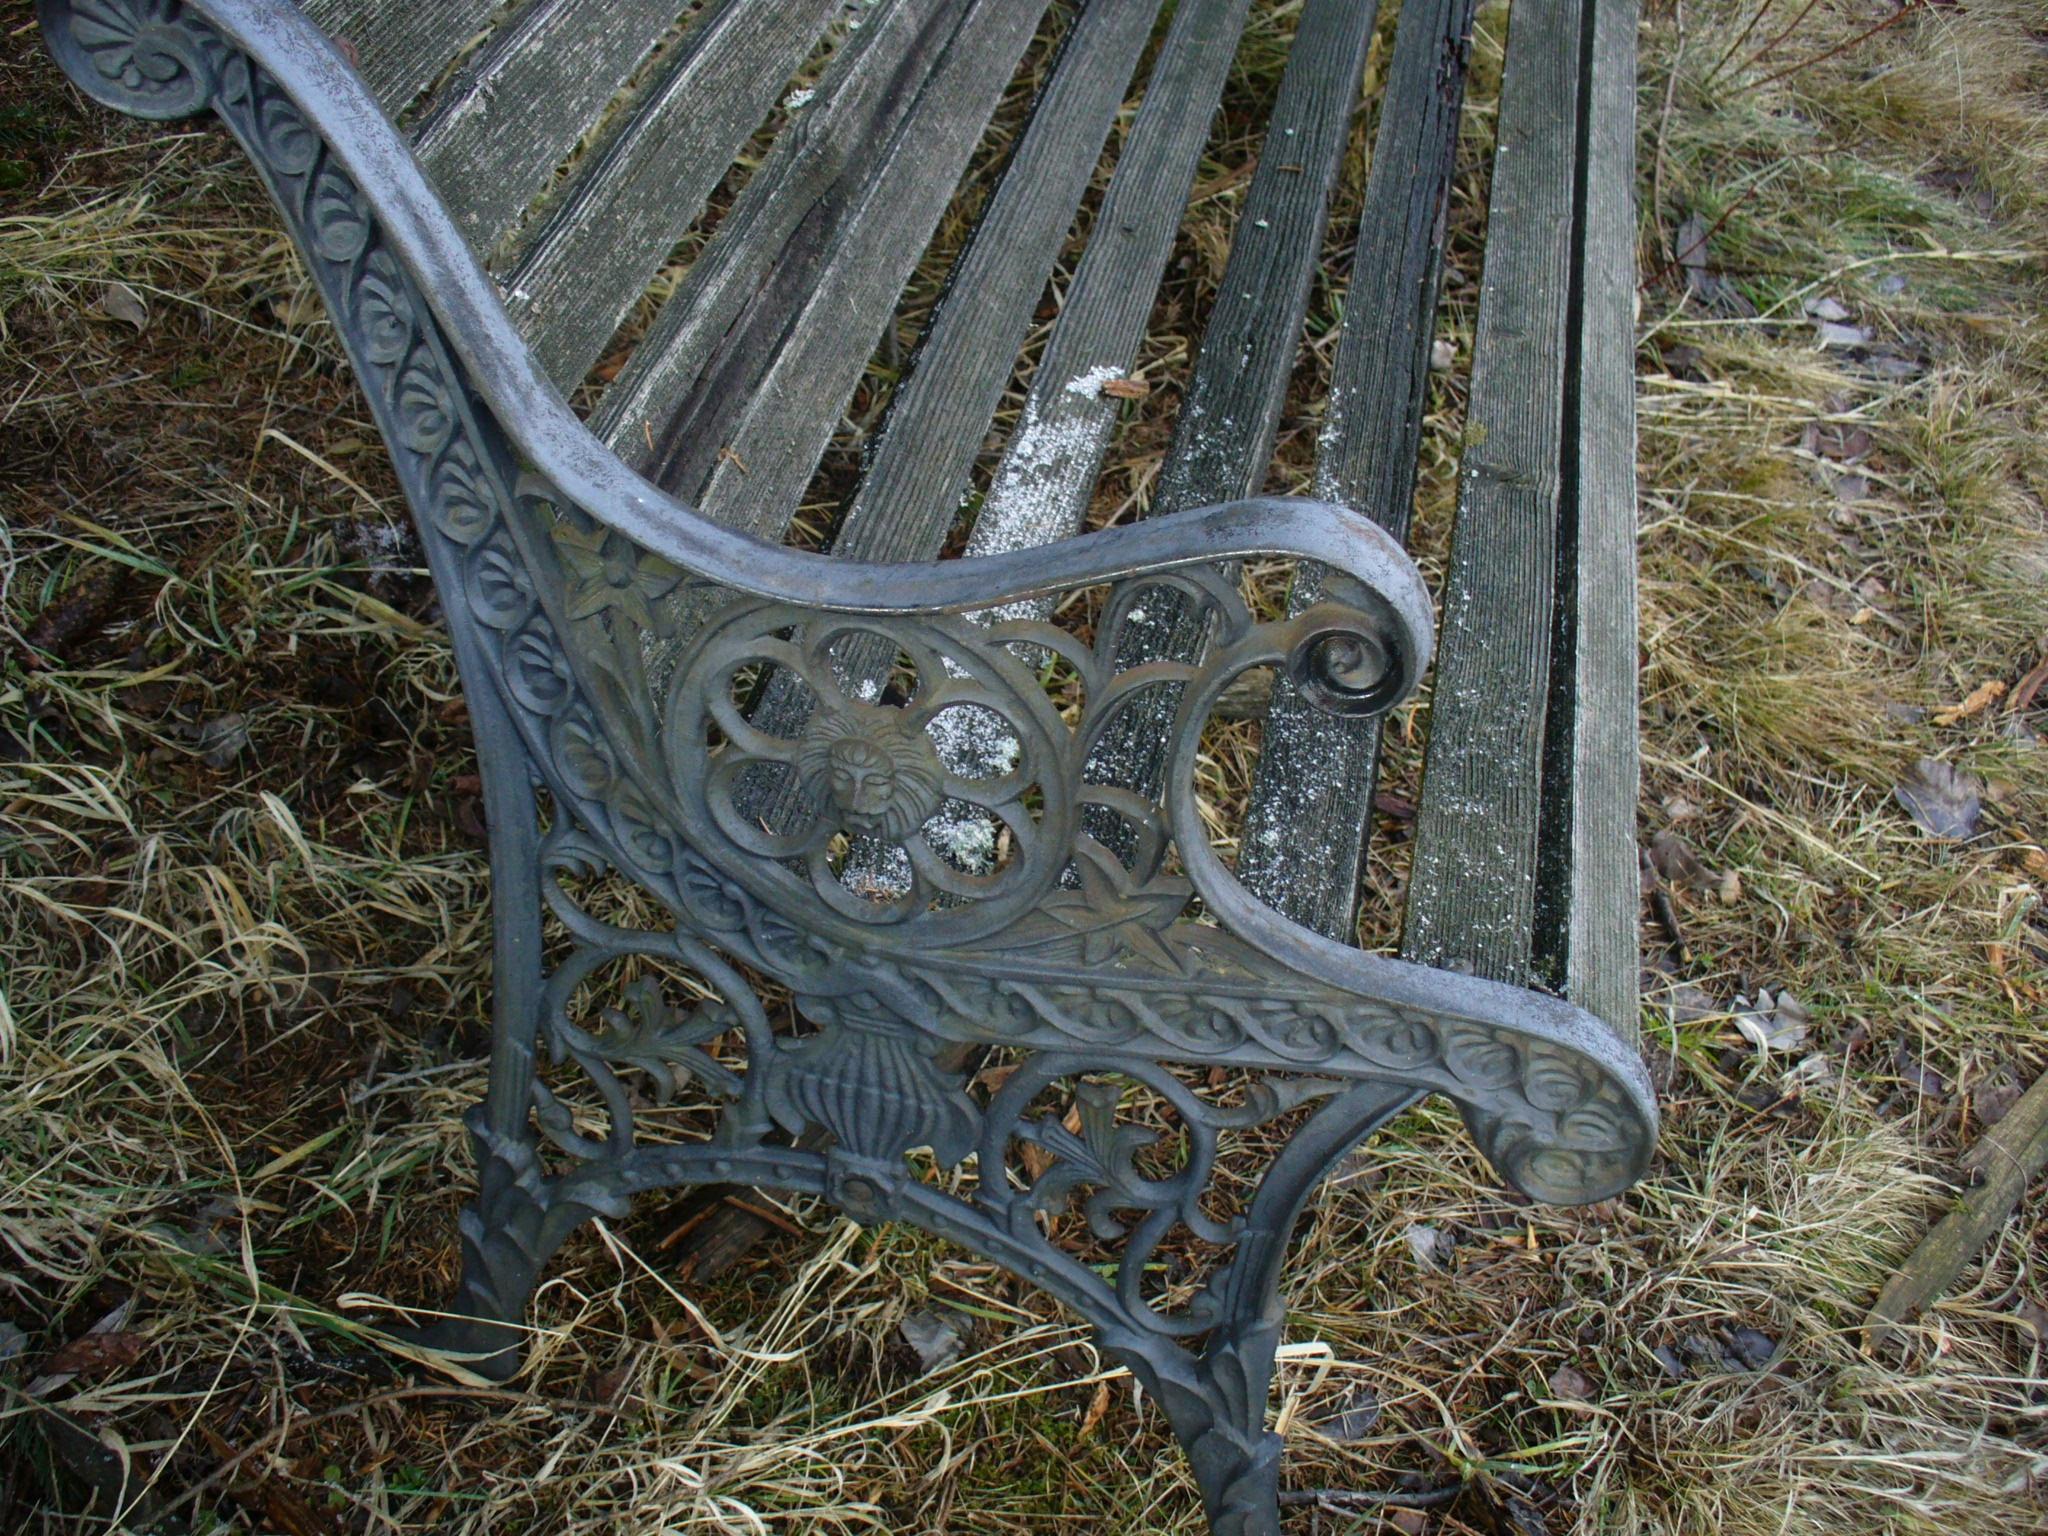 Stara ławka żeliwna,nogi